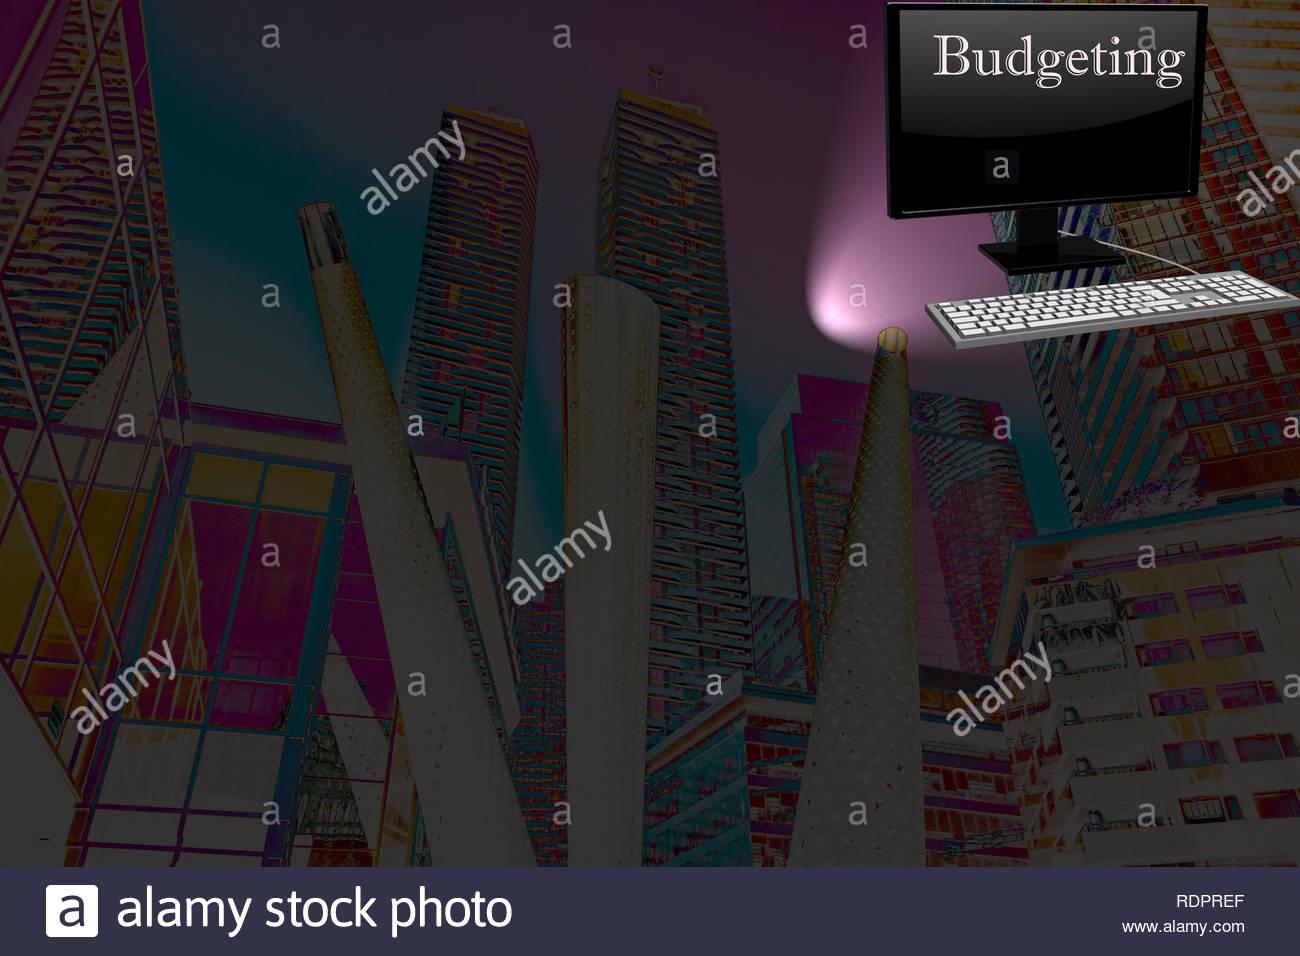 Budgeting and planning  - presentation slide - Stock Image